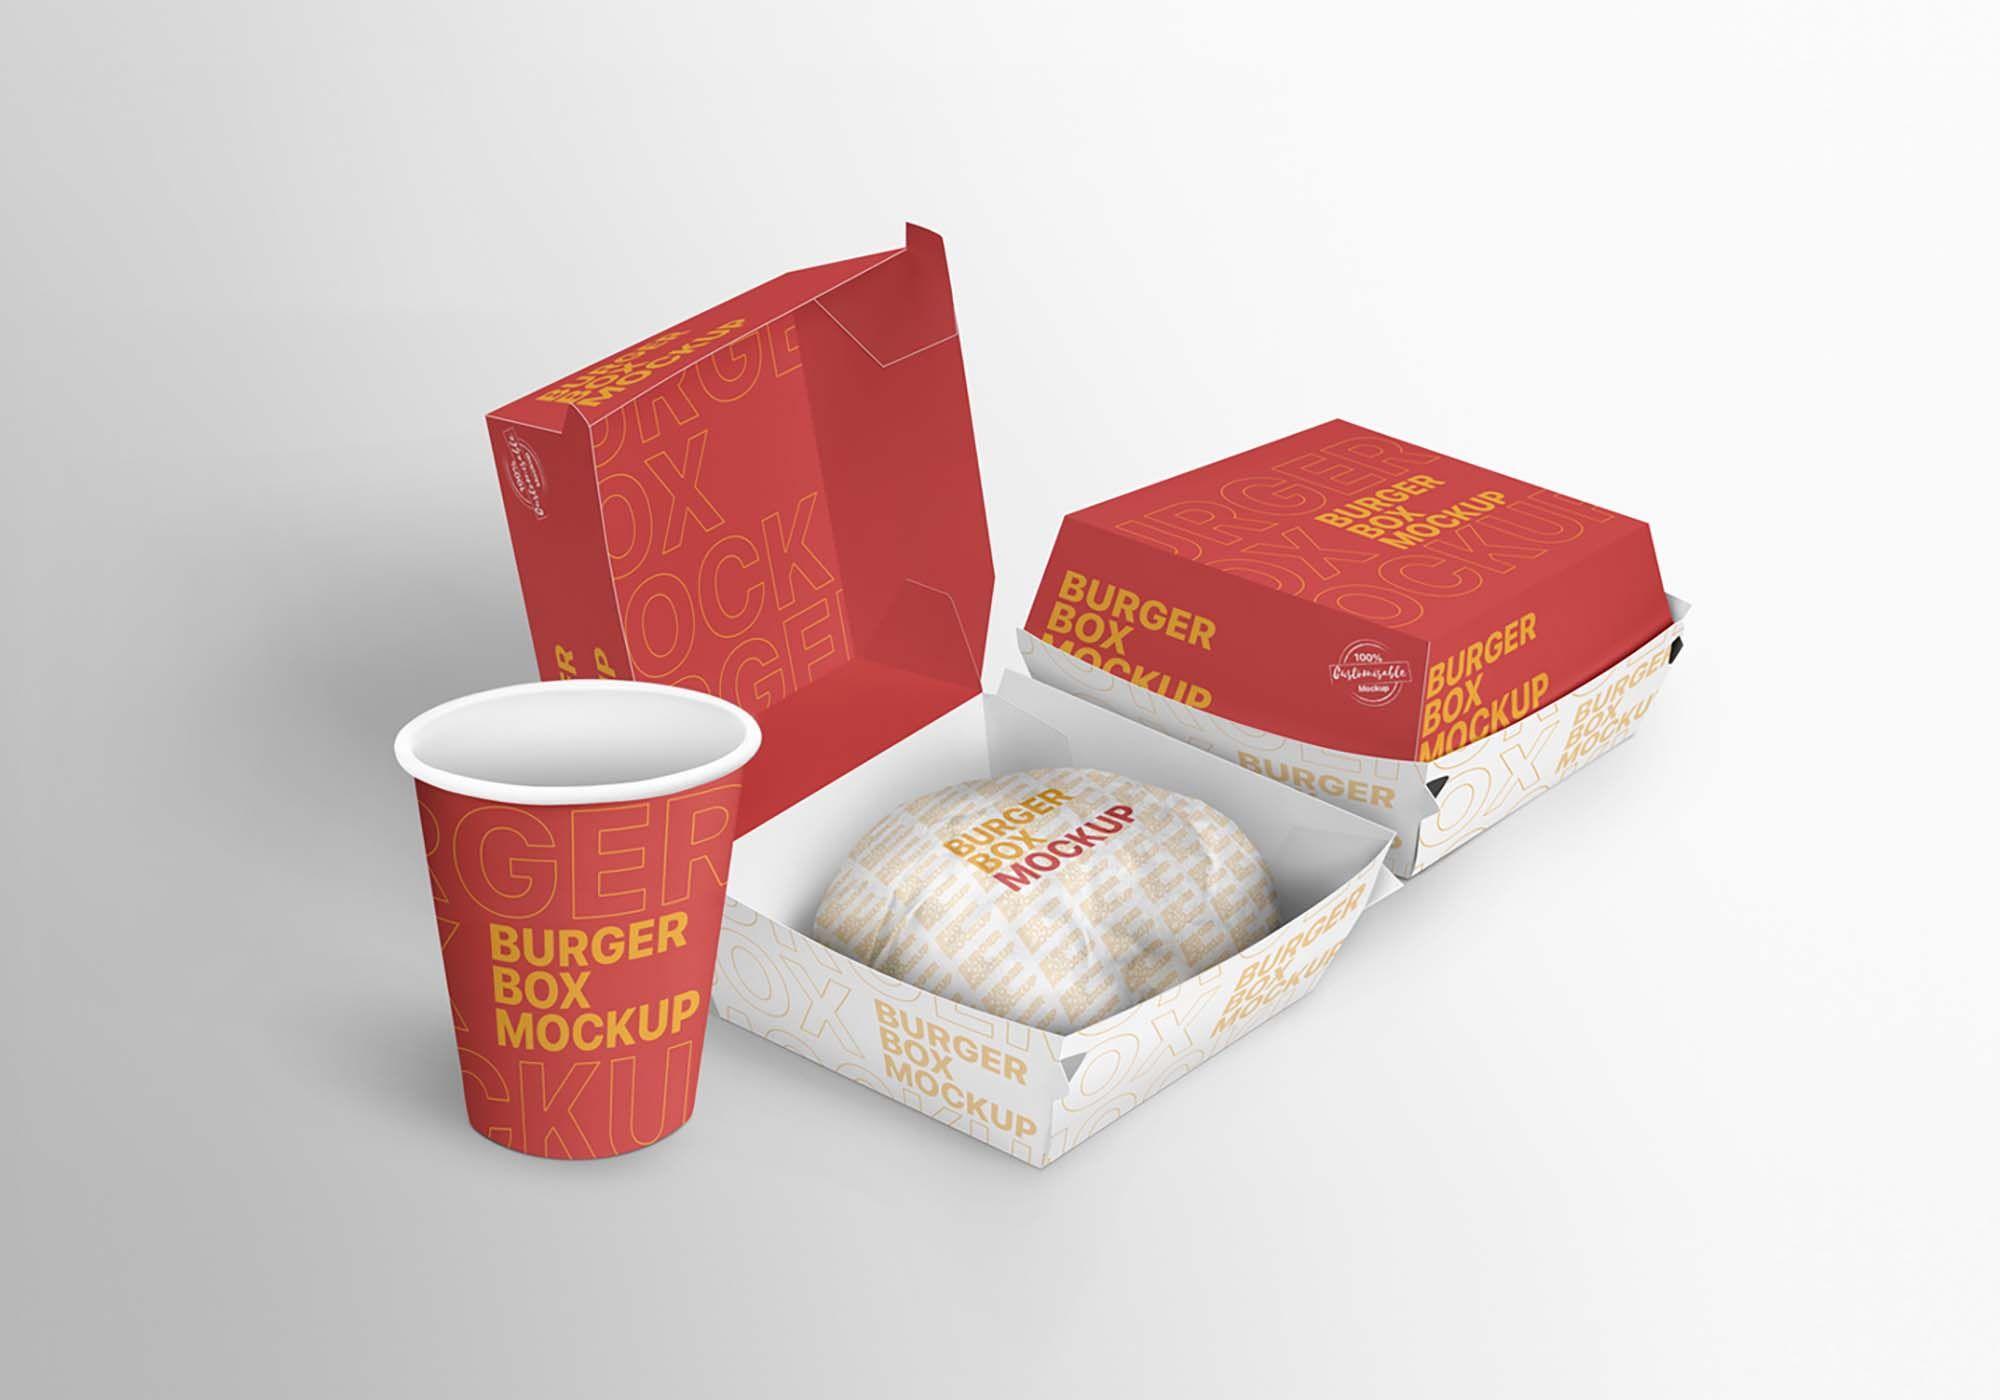 Free Burger Branding Package Mockup Burger Box Burger Branding Packaging Mockup